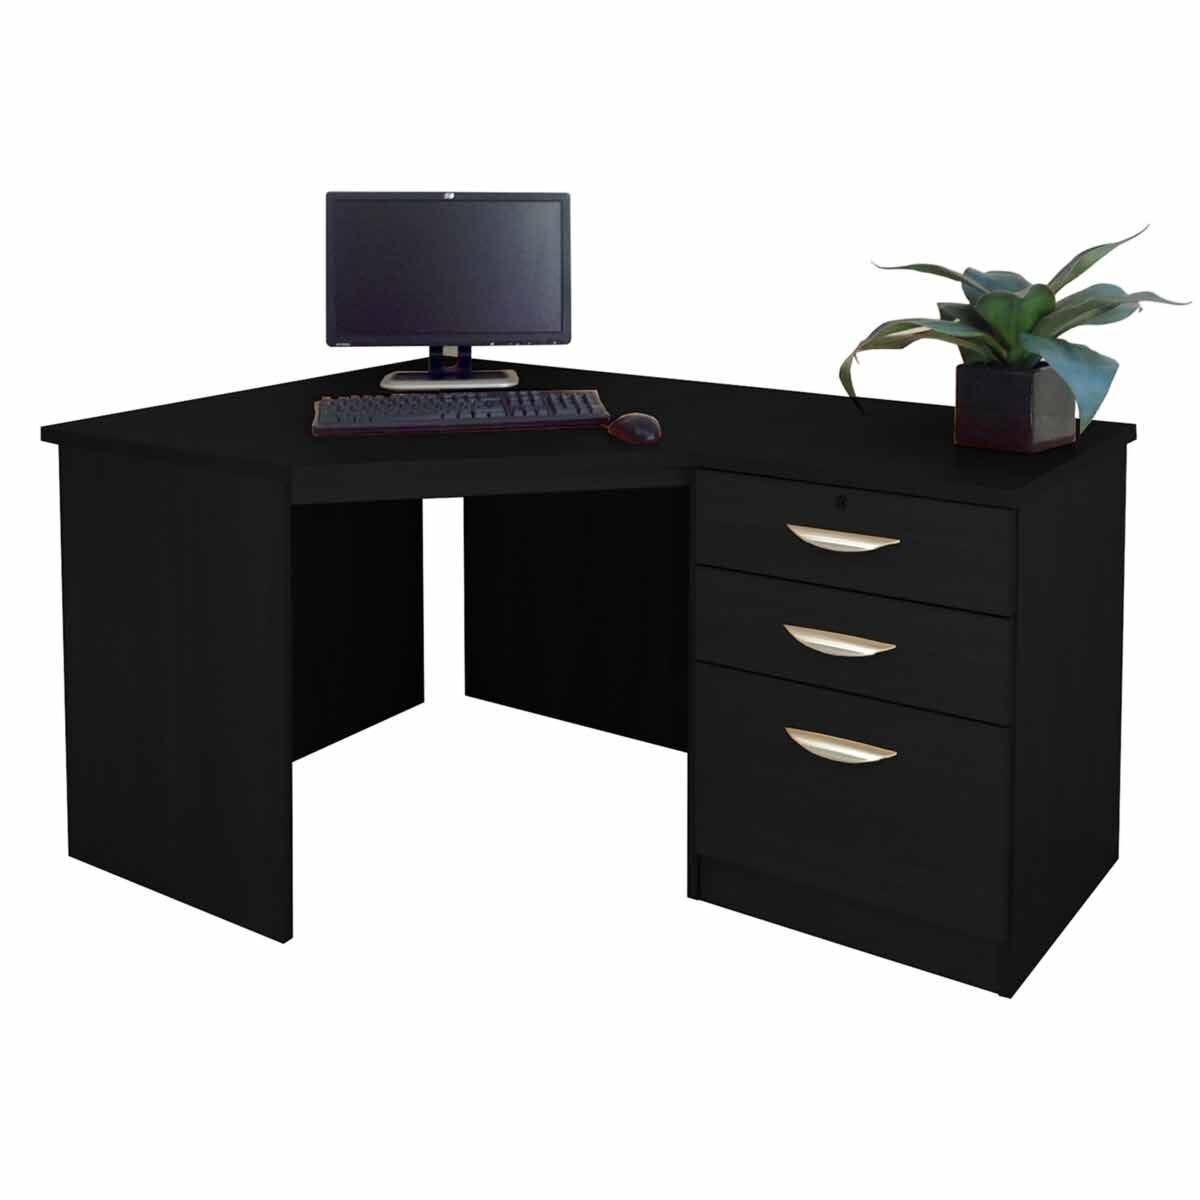 R White Home Office Corner Desk With Three Drawers Black Havana